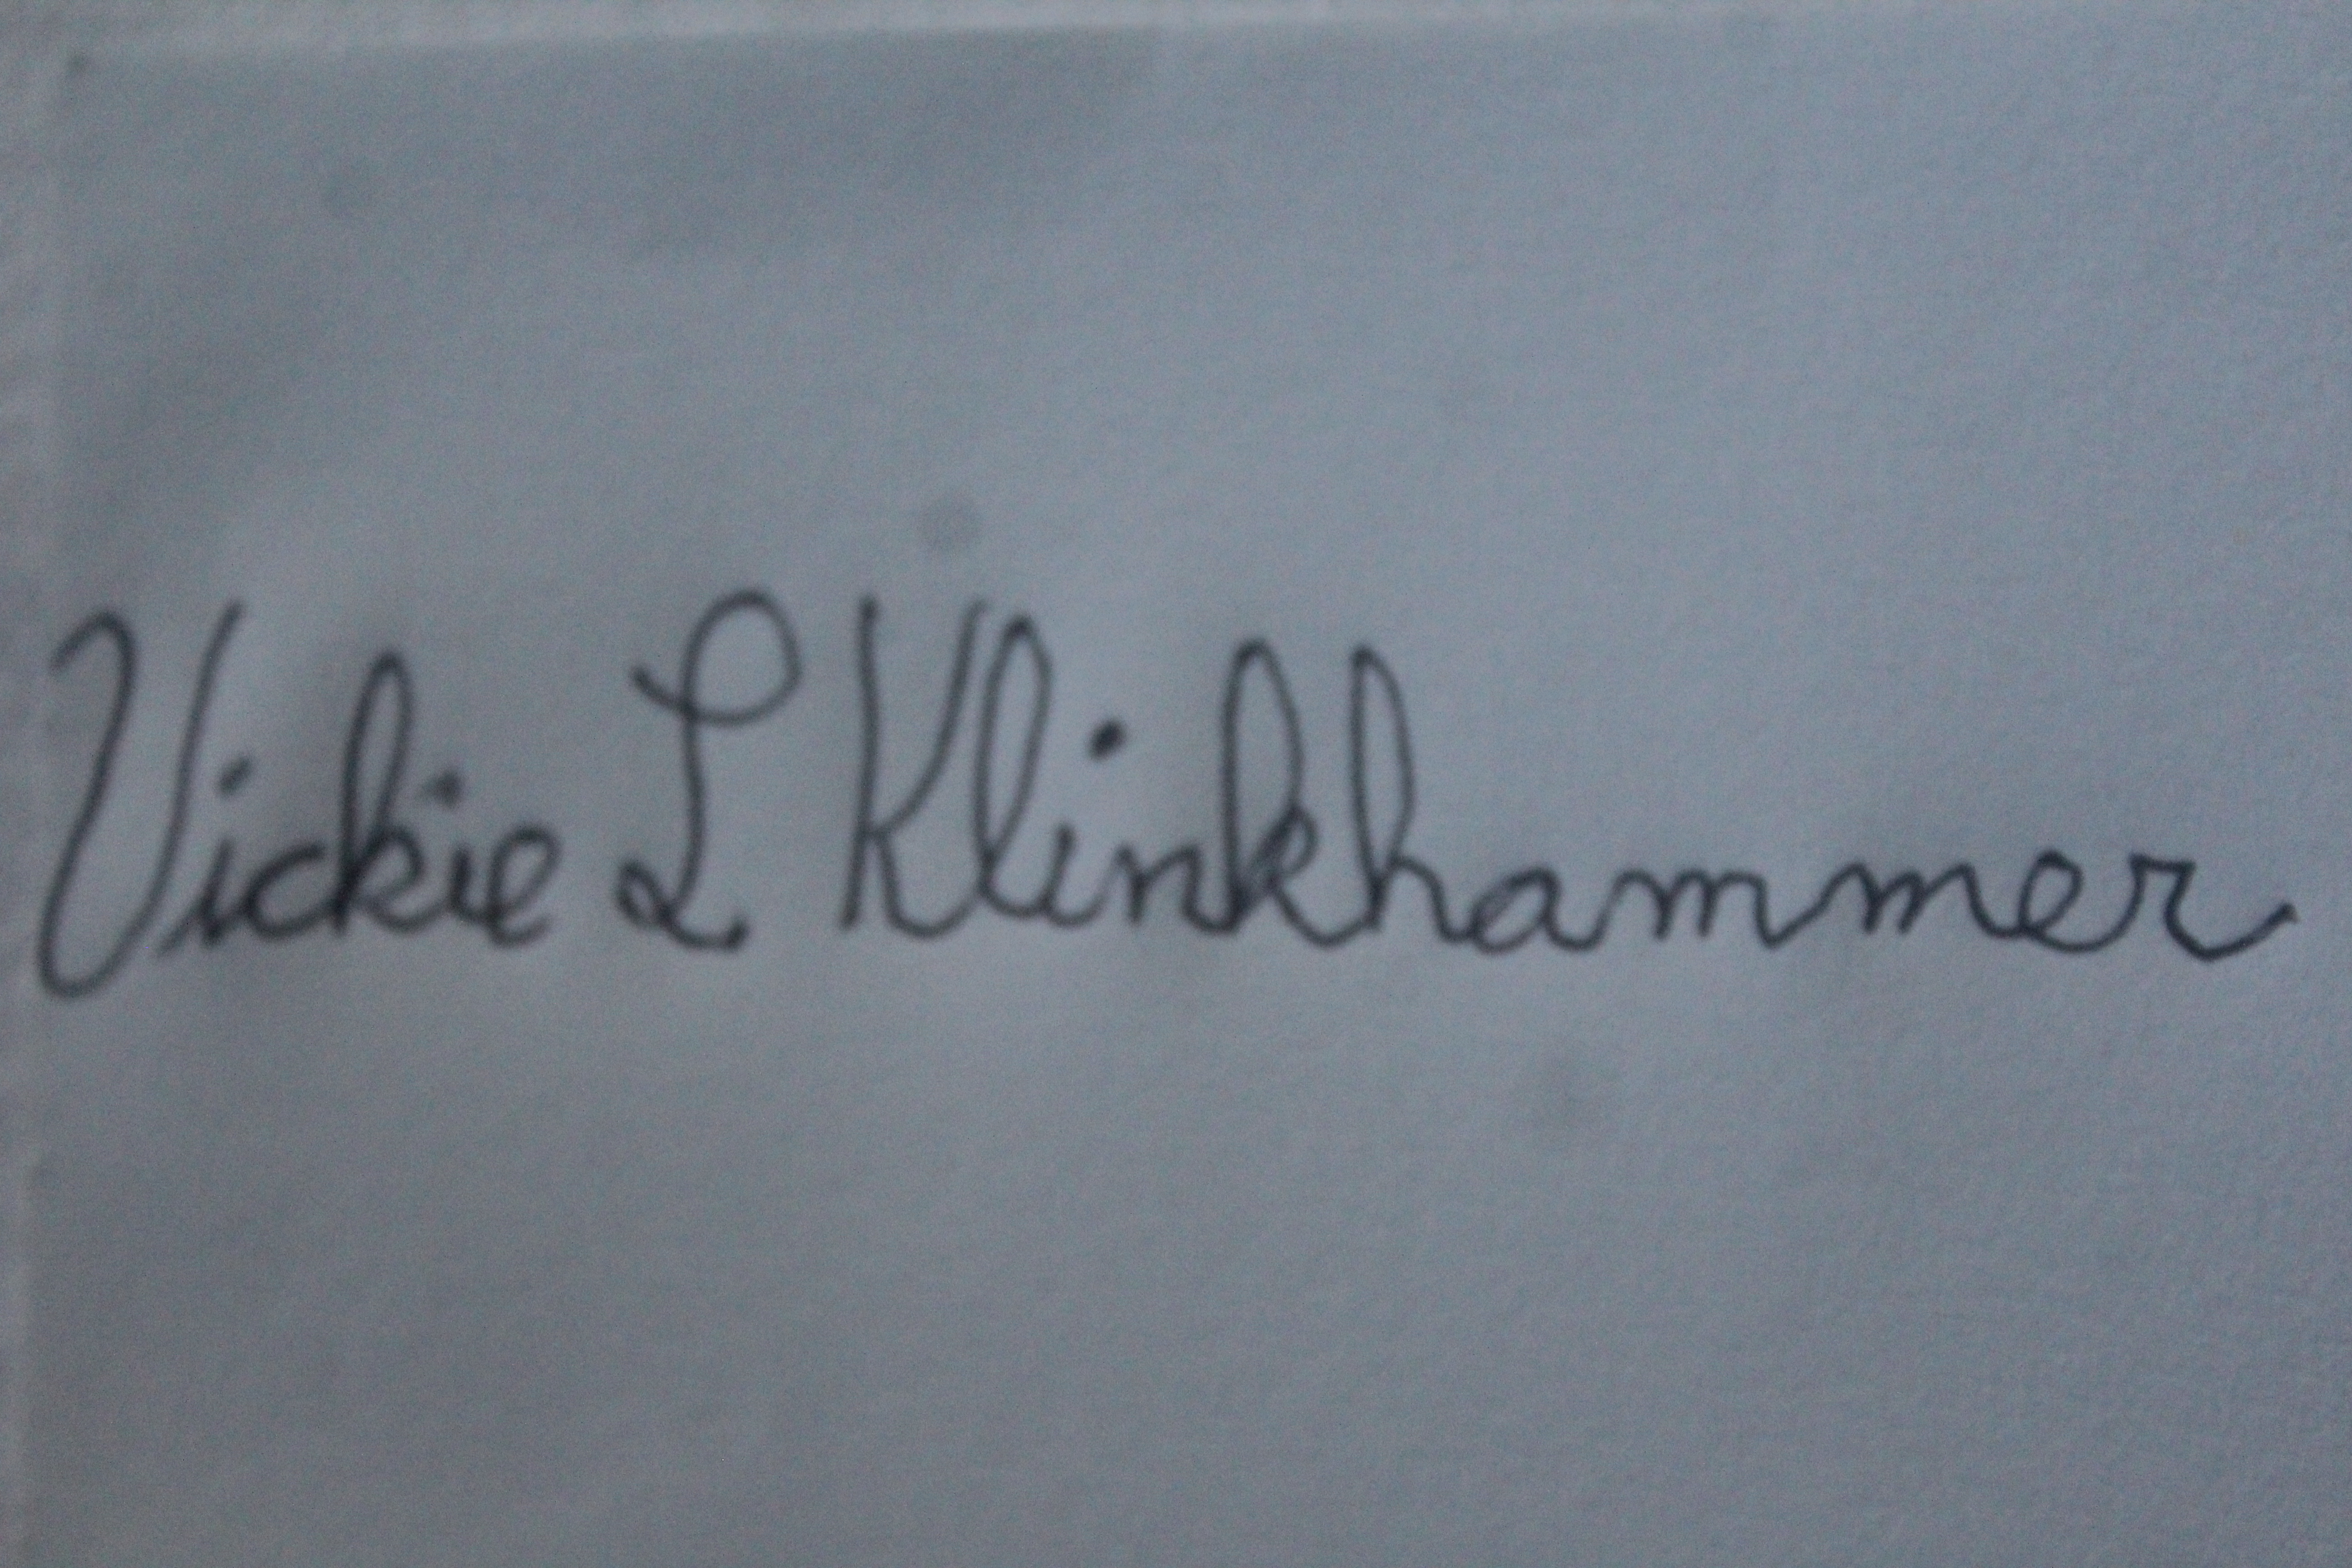 Vickie Klinkhammer's Signature